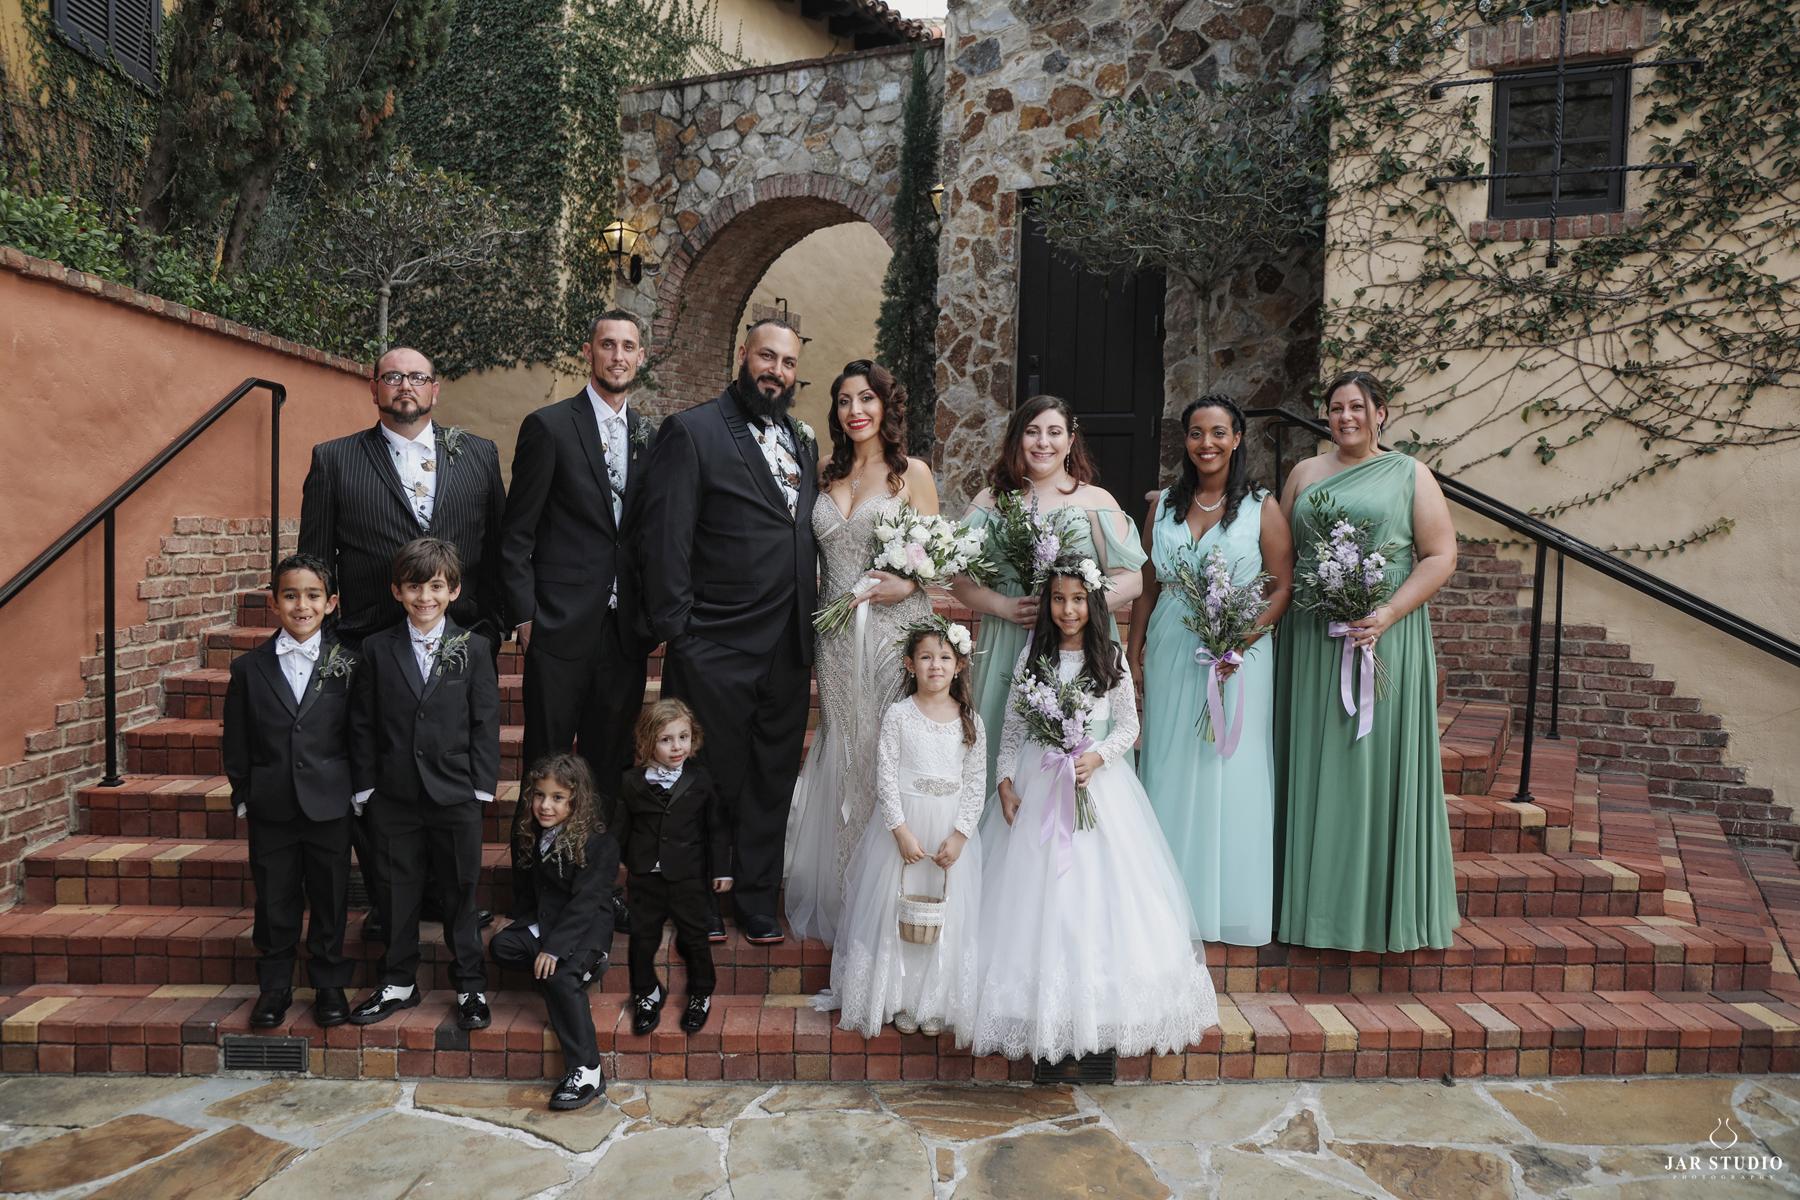 15-formal-bridal-party-bella-collina-photographer.jpg